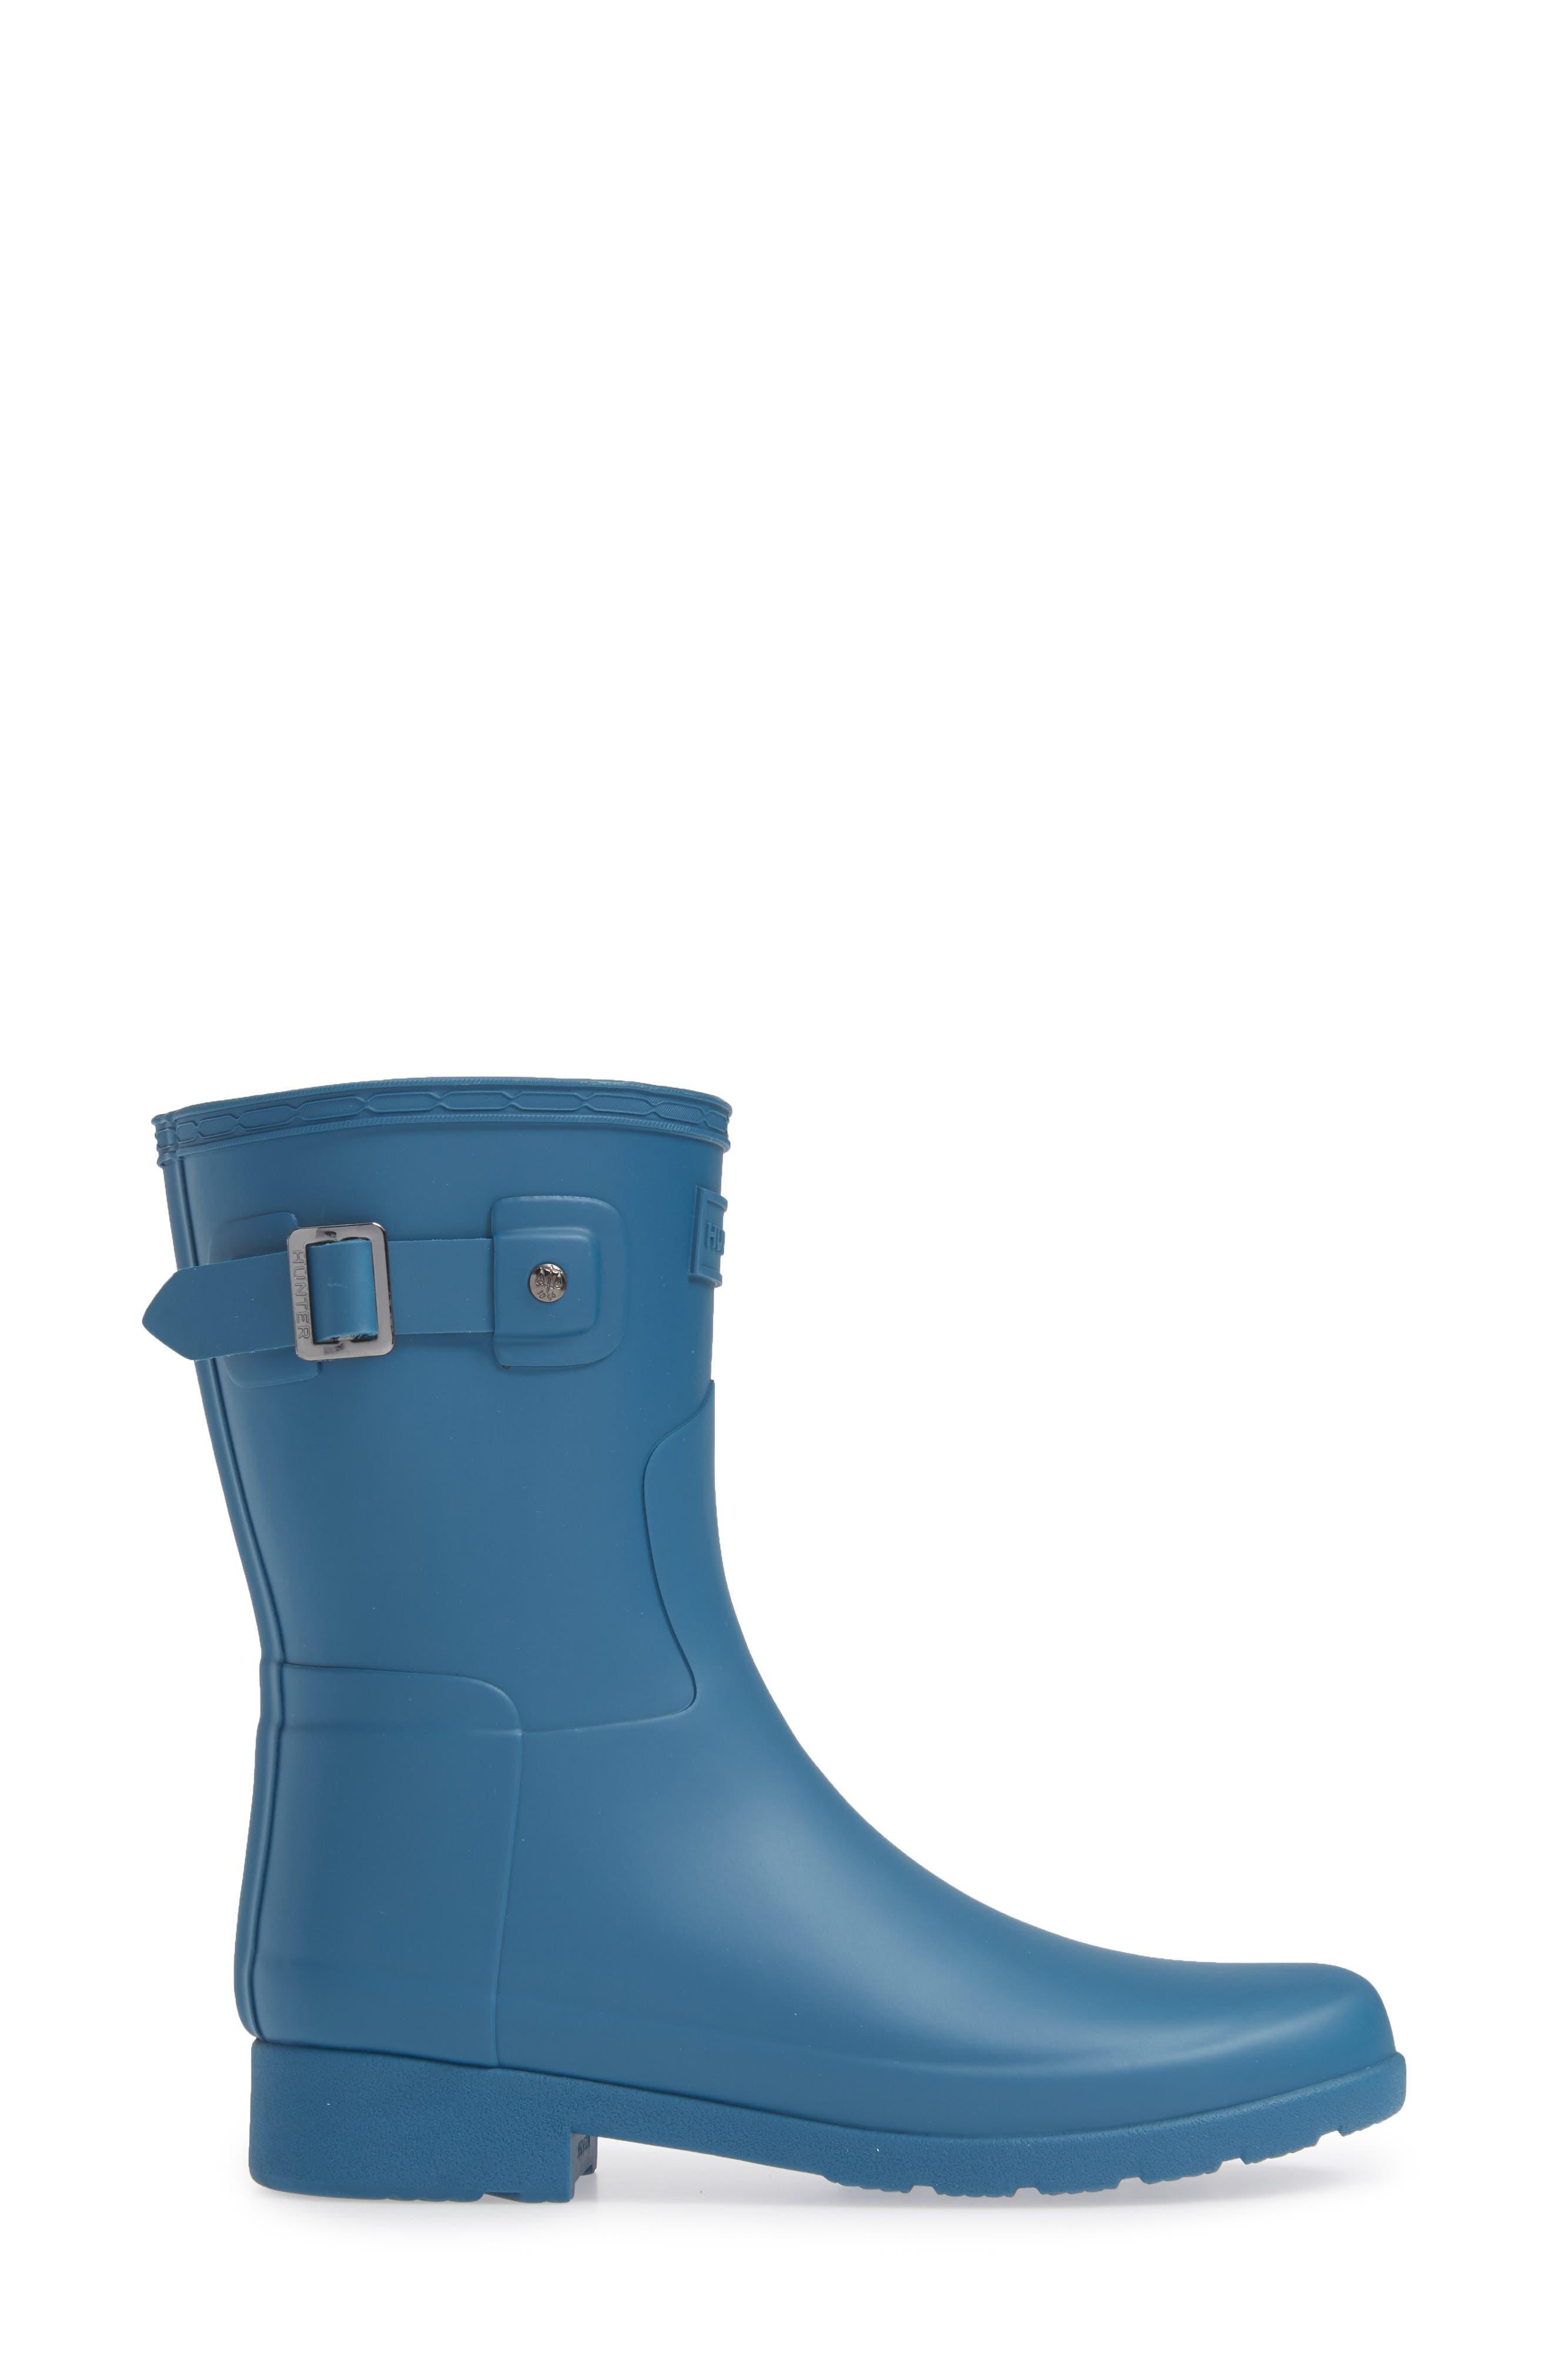 HUNTER,                             Original Refined Short Waterproof Rain Boot,                             Alternate thumbnail 3, color,                             440